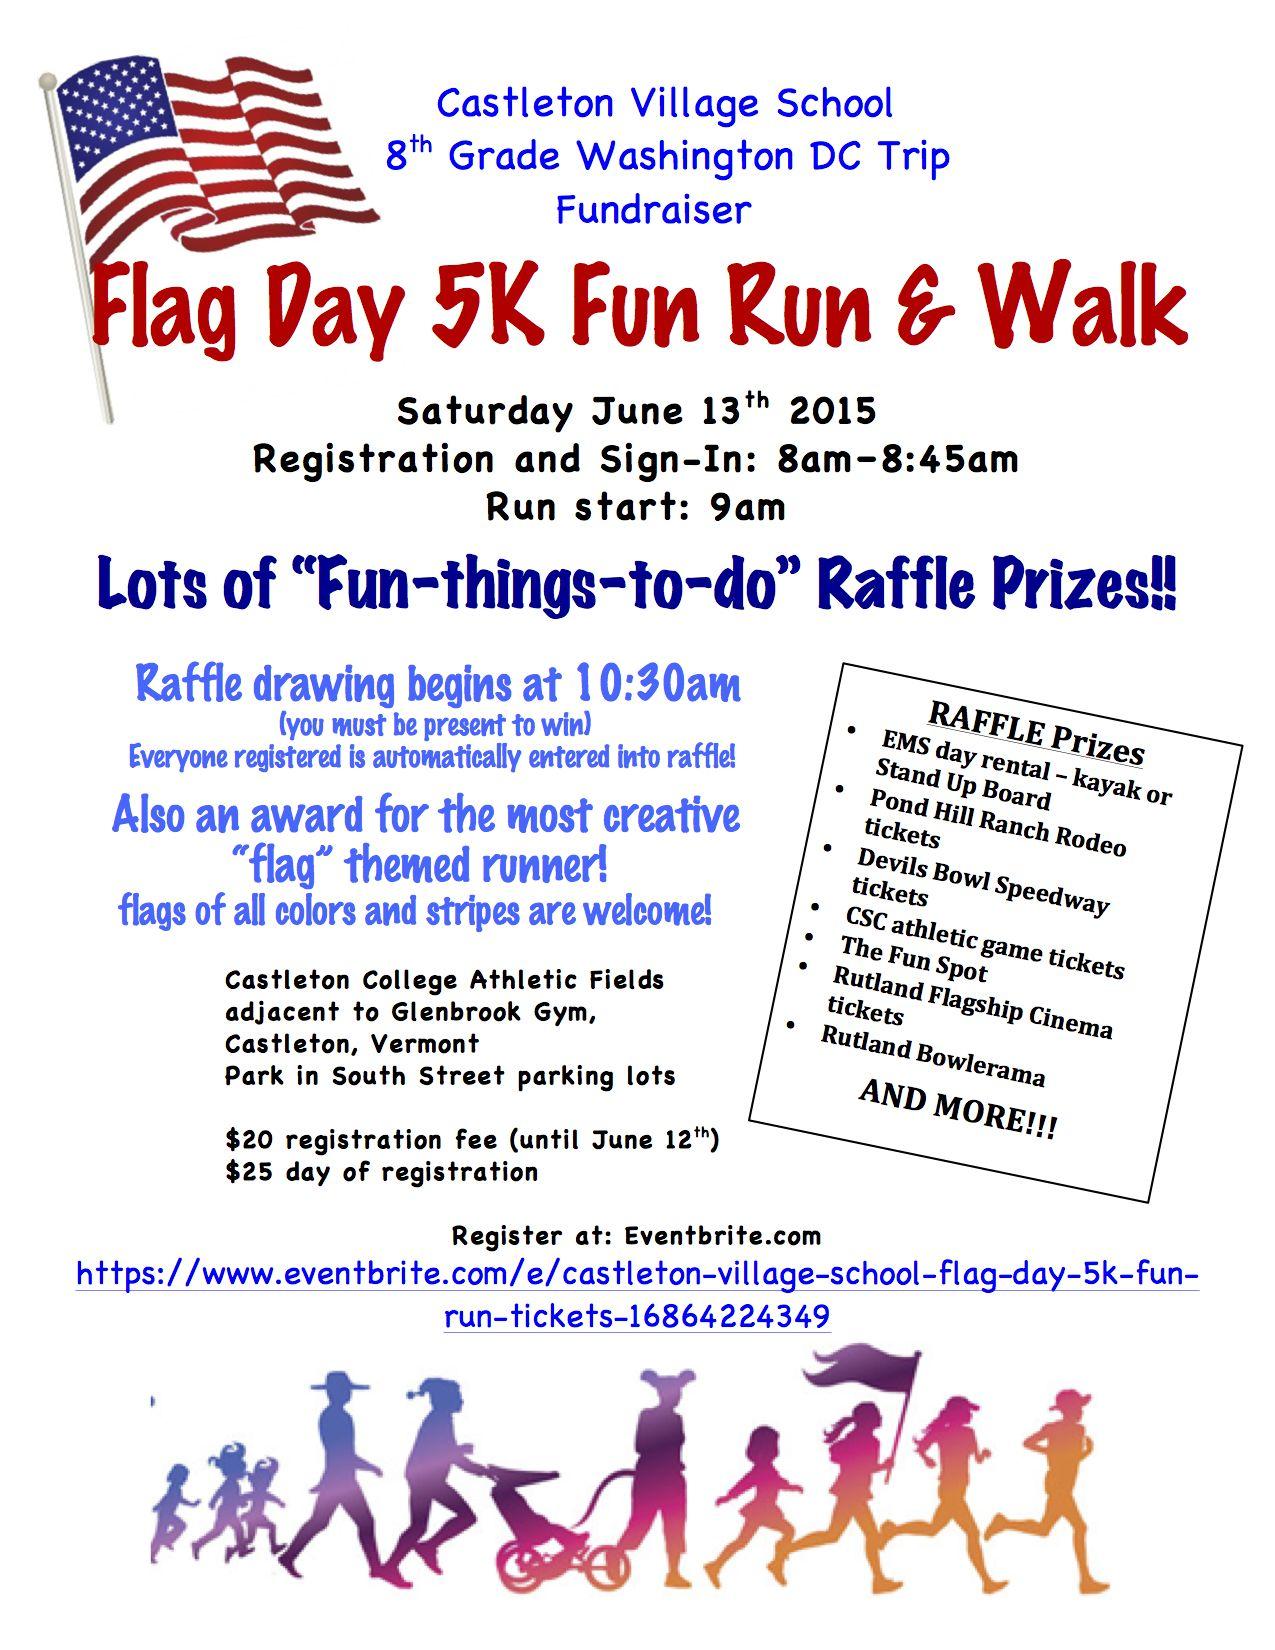 Flag Day 5k Fun Run Rutland Region Chamber Of Commerce